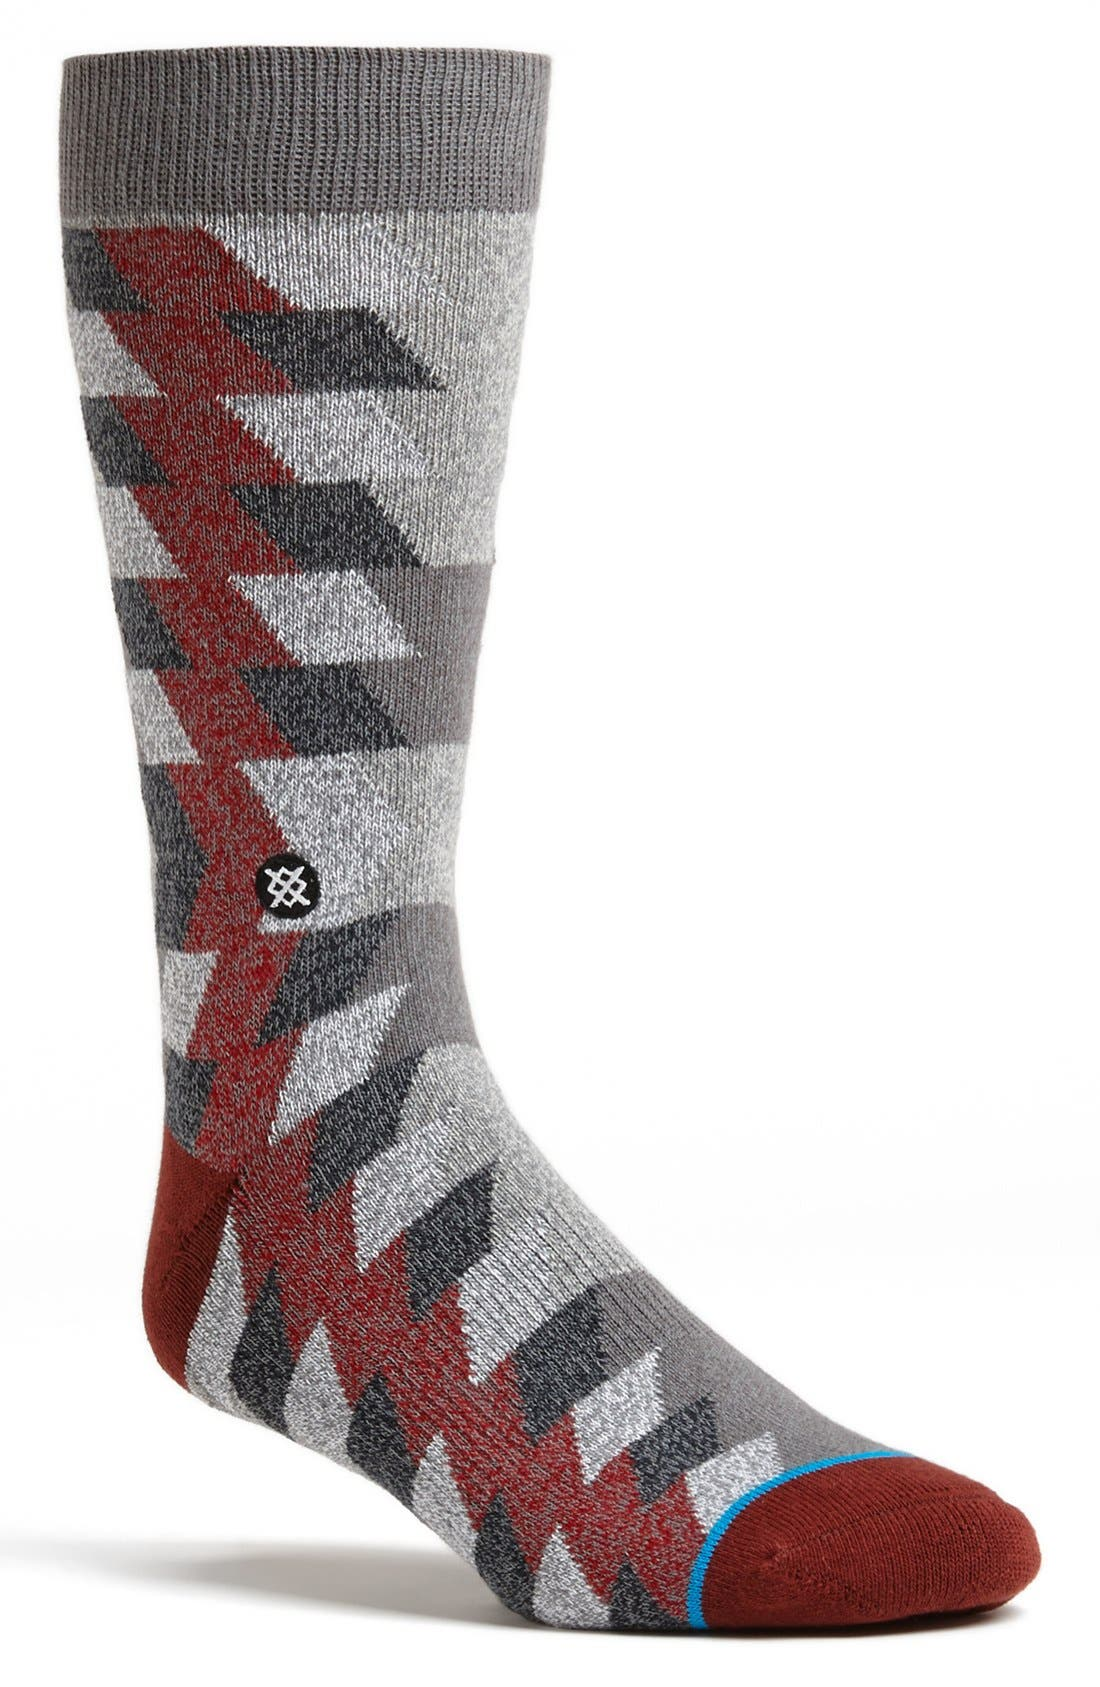 Main Image - Stance 'Shorewood' Socks